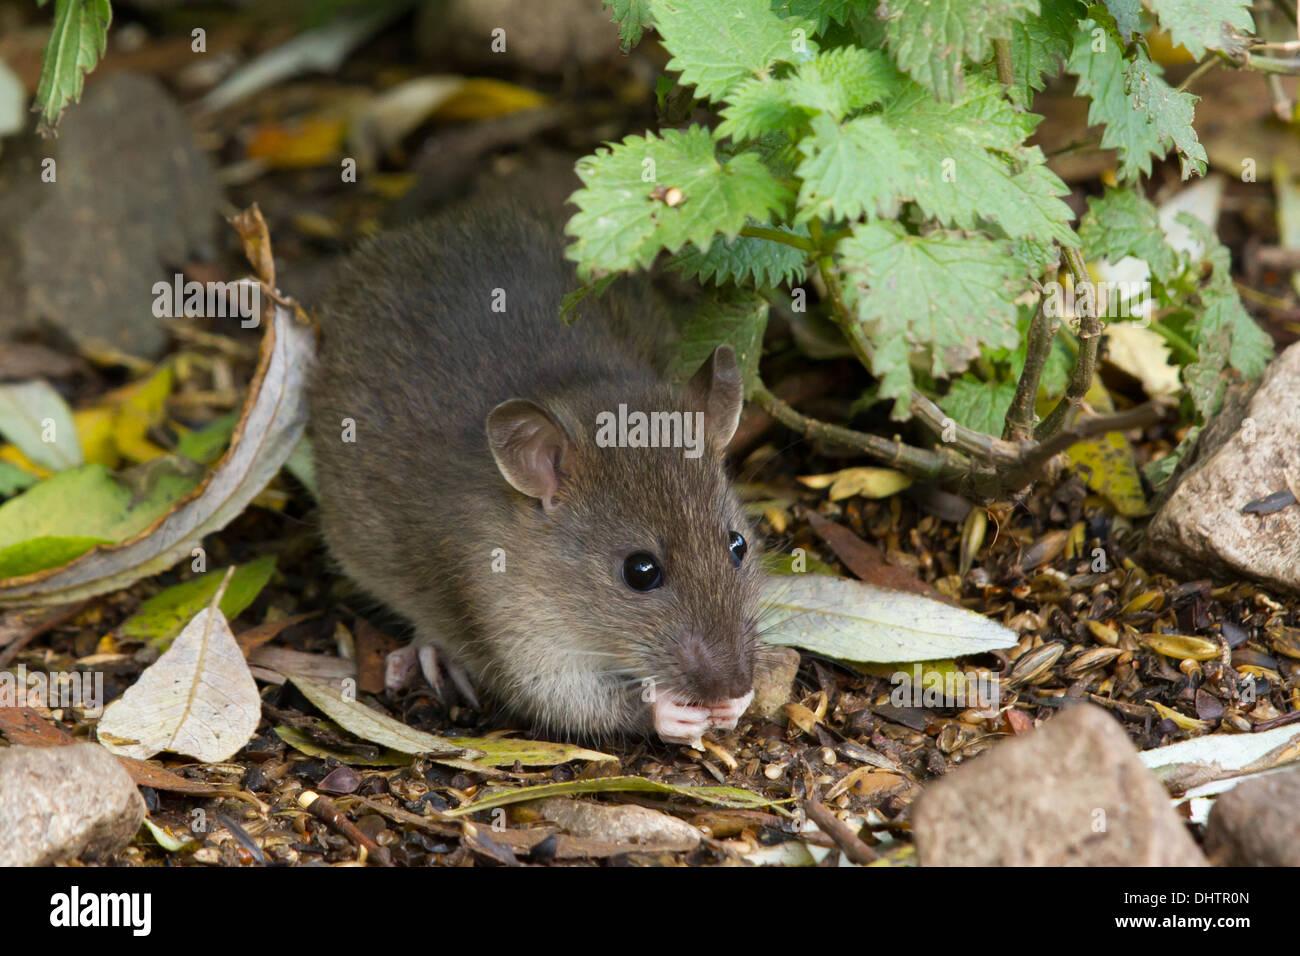 newly-weened Brown Rat (Rattus norvegicus) feeding on spilt grain - Stock Image